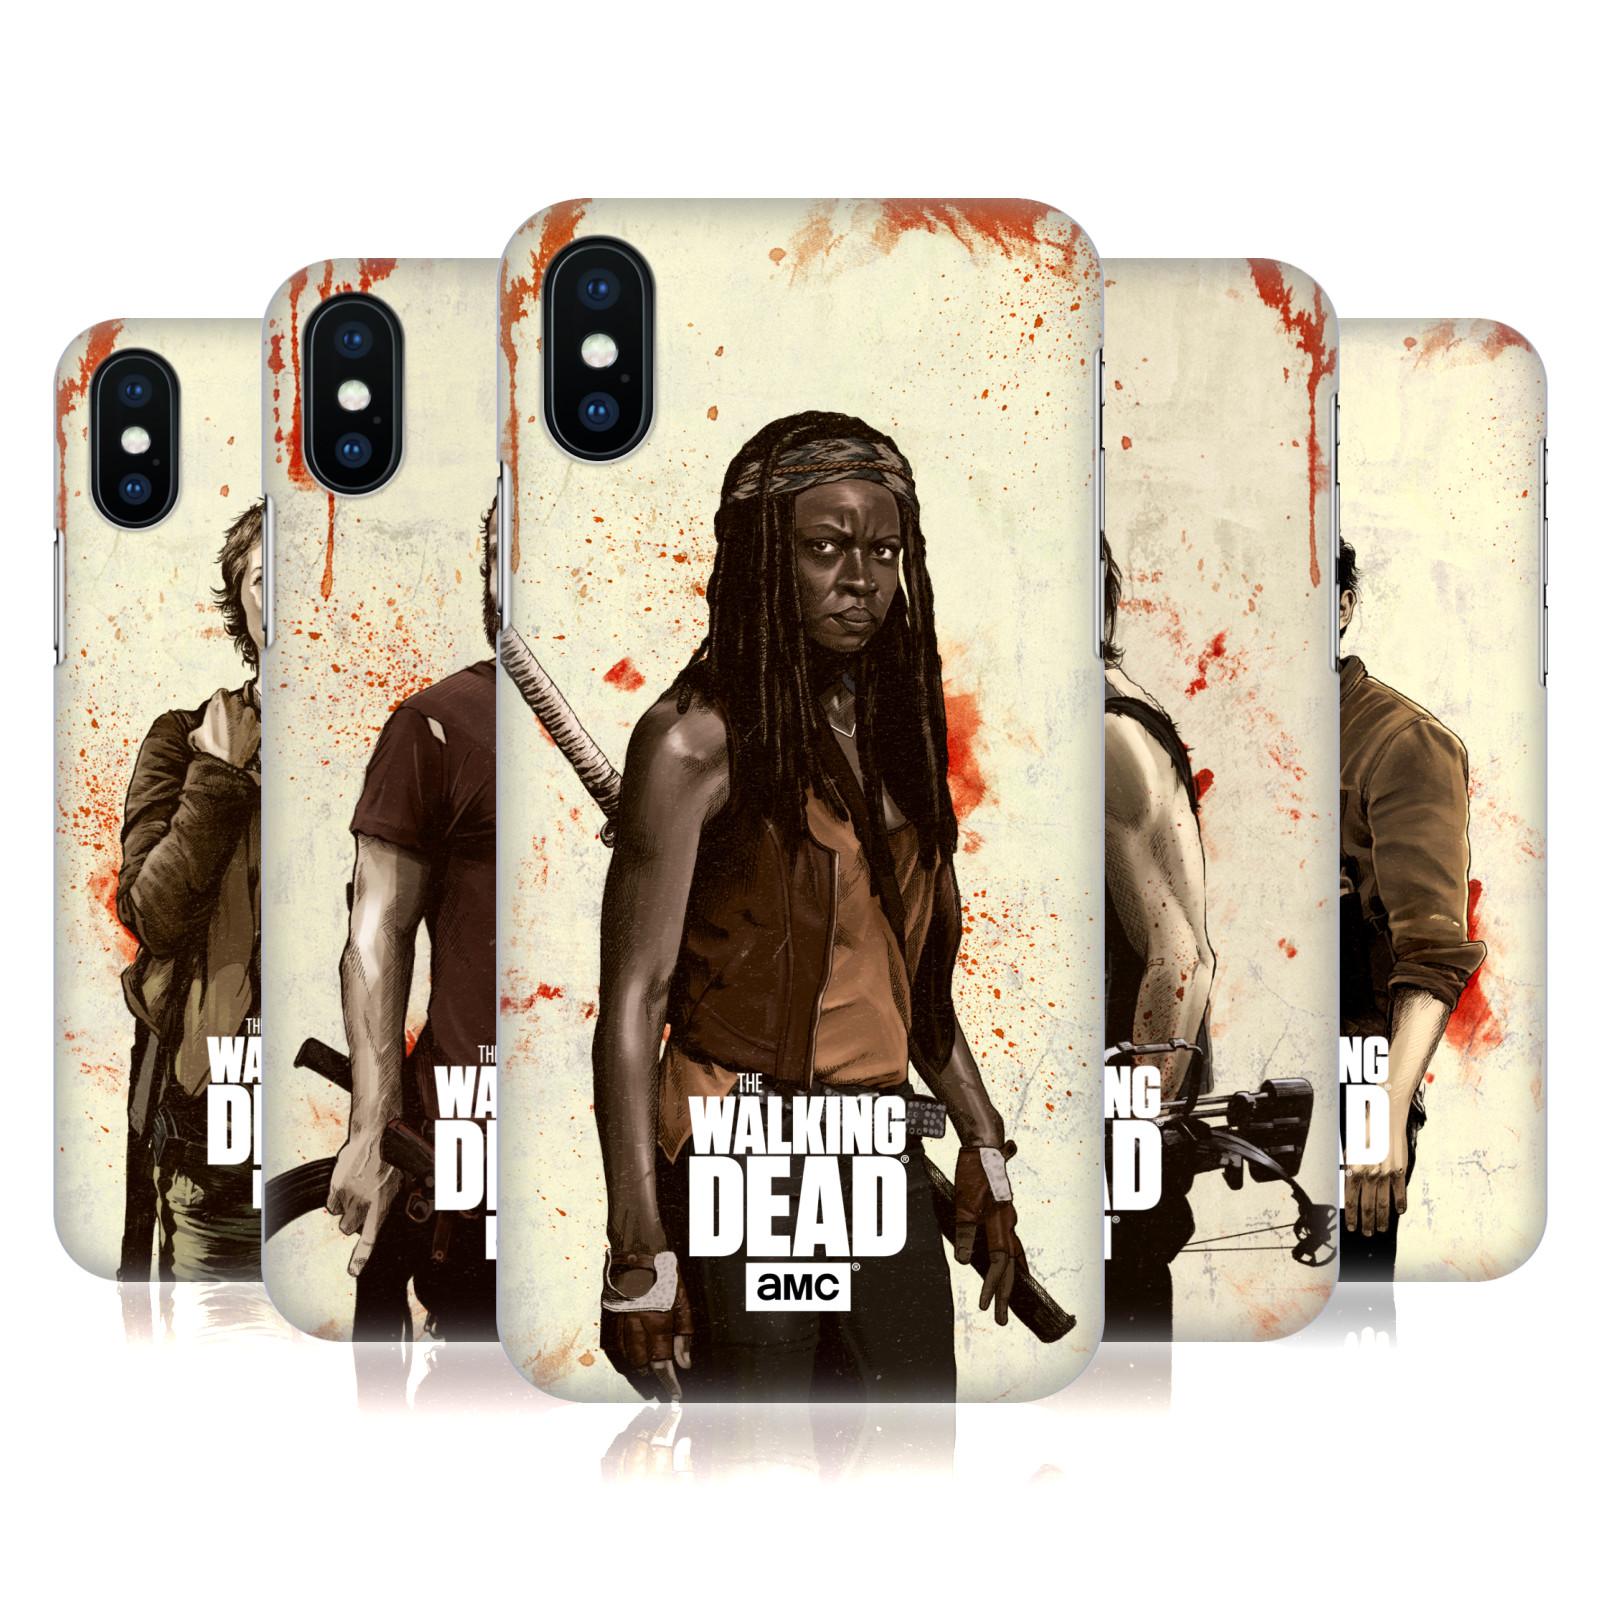 AMC The Walking Dead Distressed Illustrations